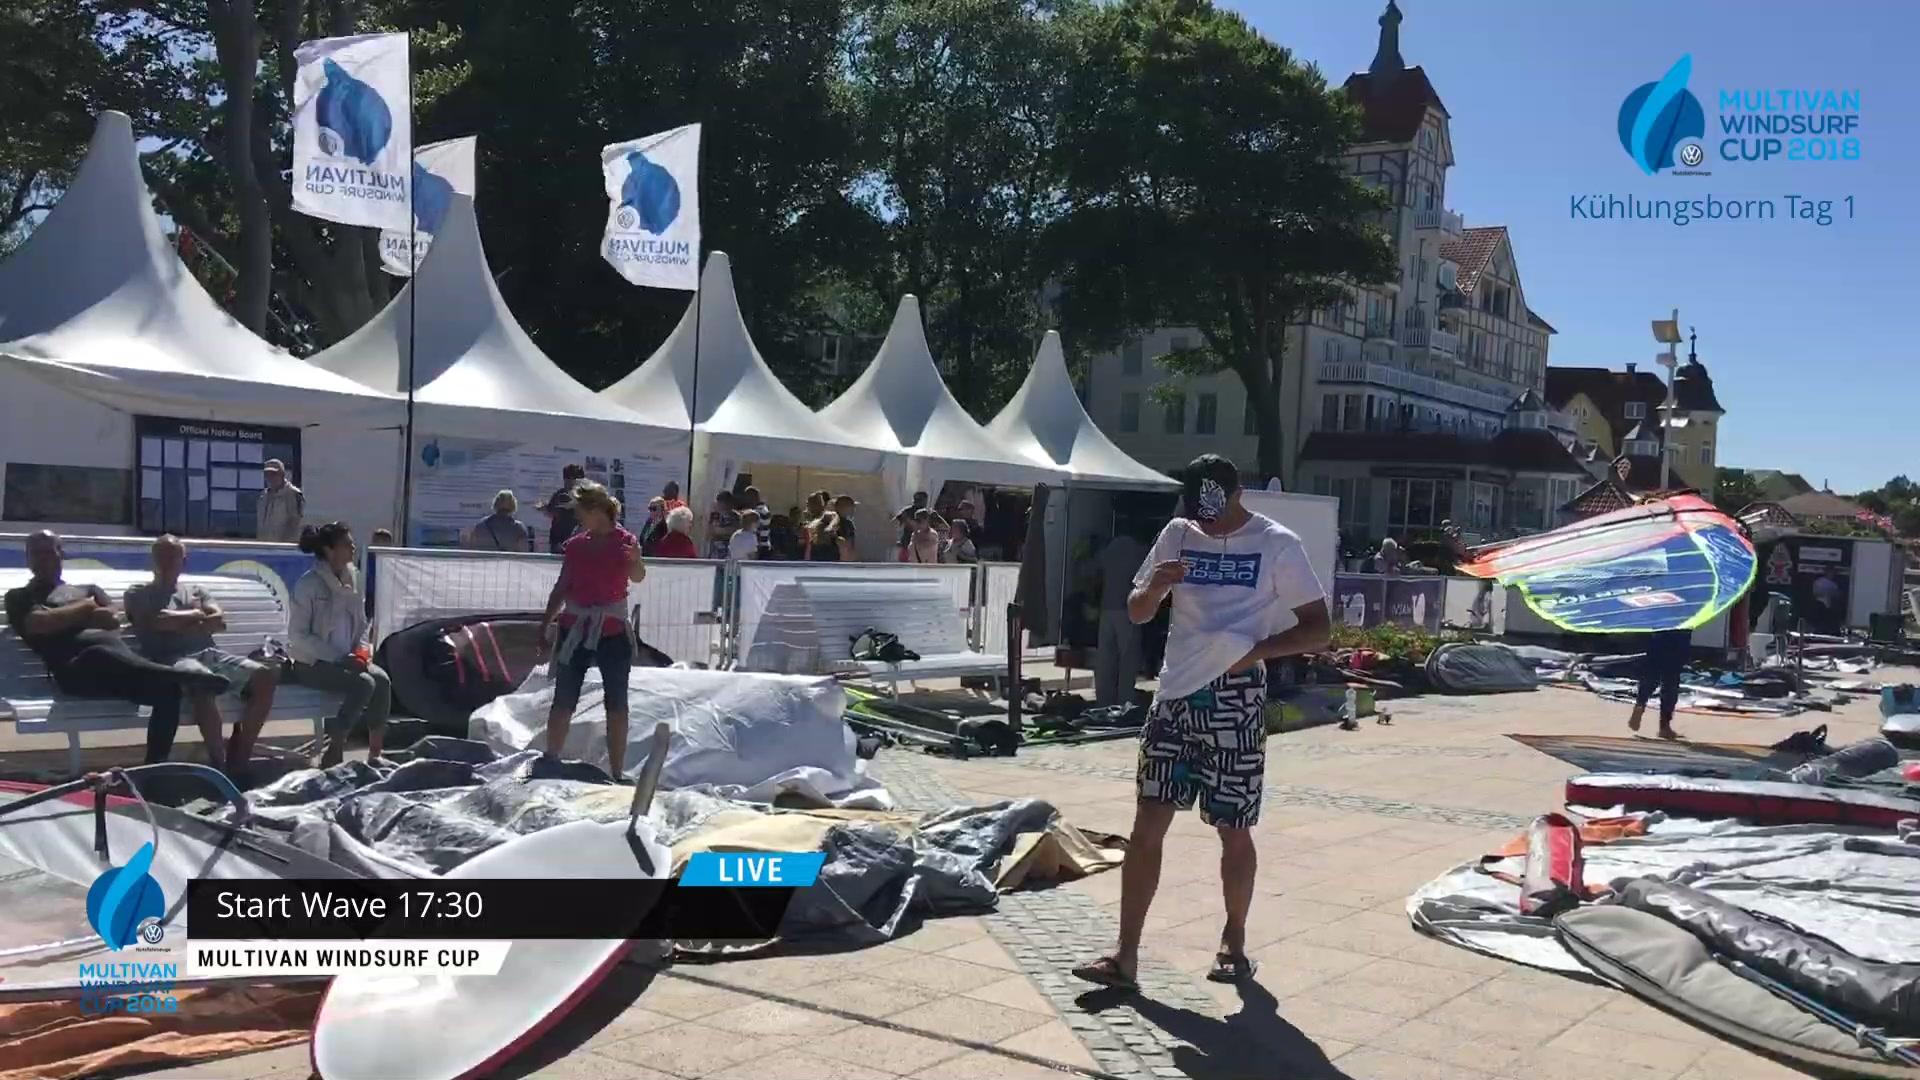 Multivan Windsurf Cup Kühlungsborn - Tag 1